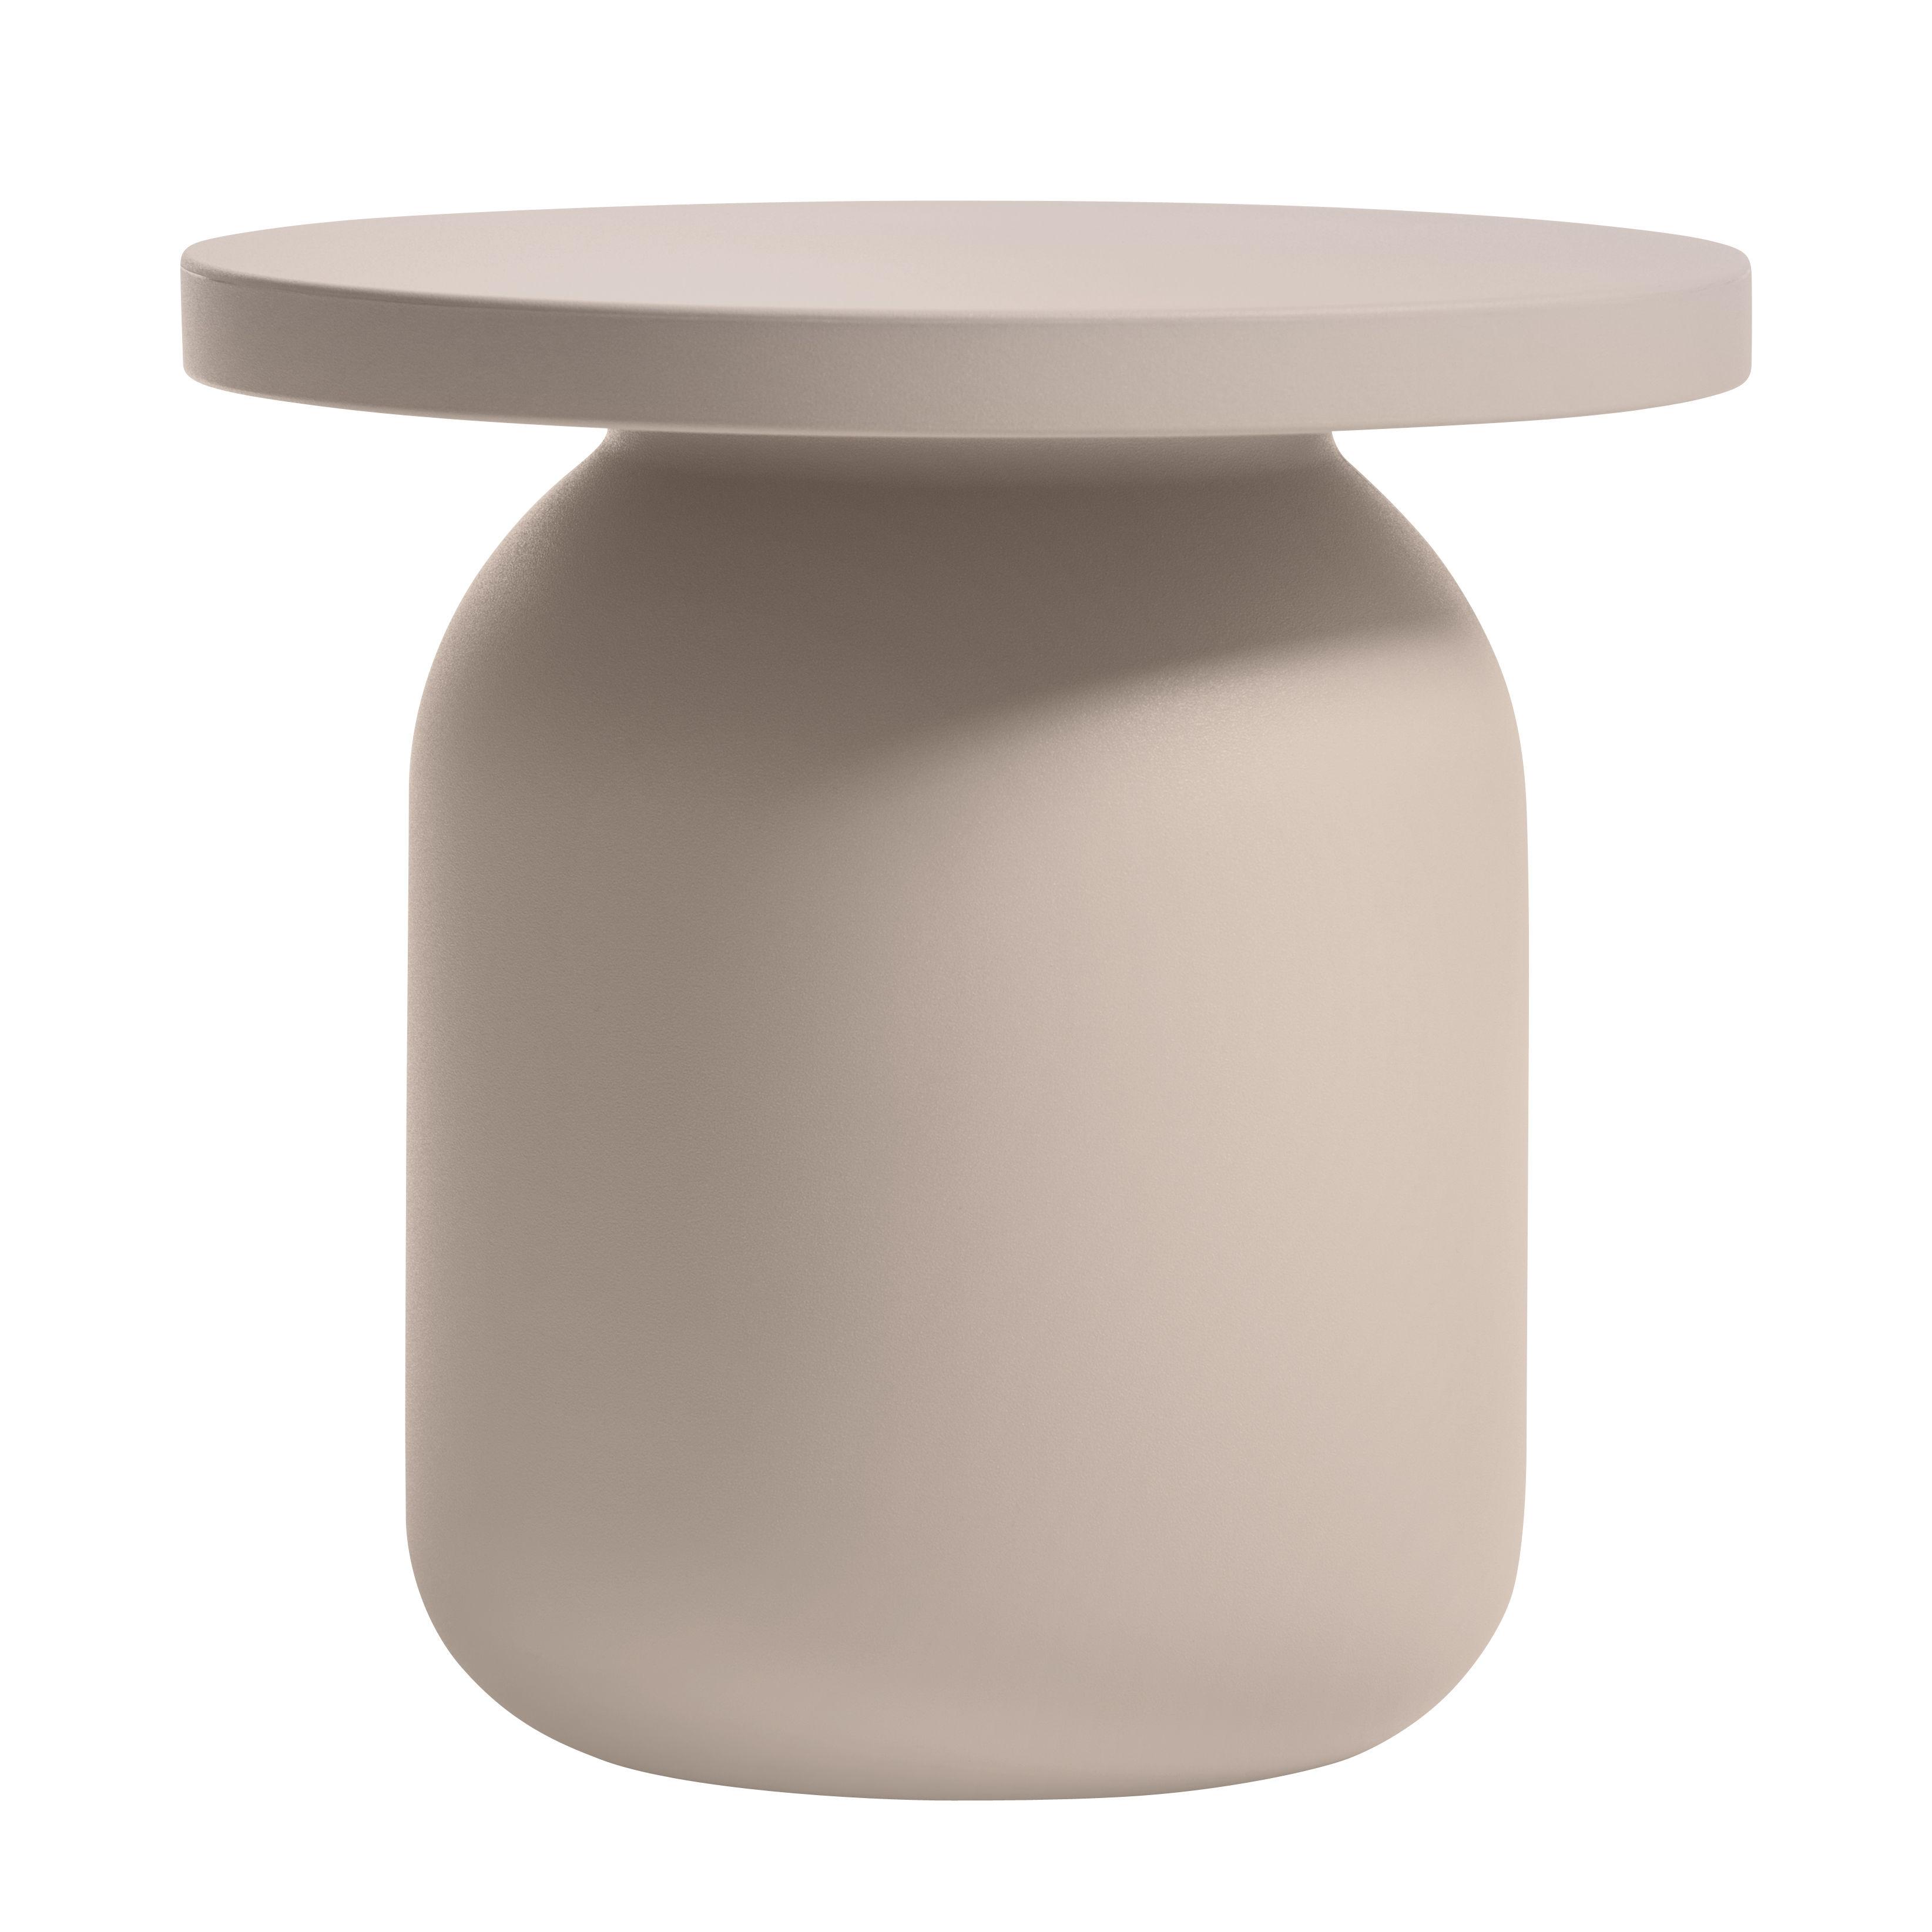 Furniture - Coffee Tables - Juju End table - Stool by Serralunga - Taupe - Polythene